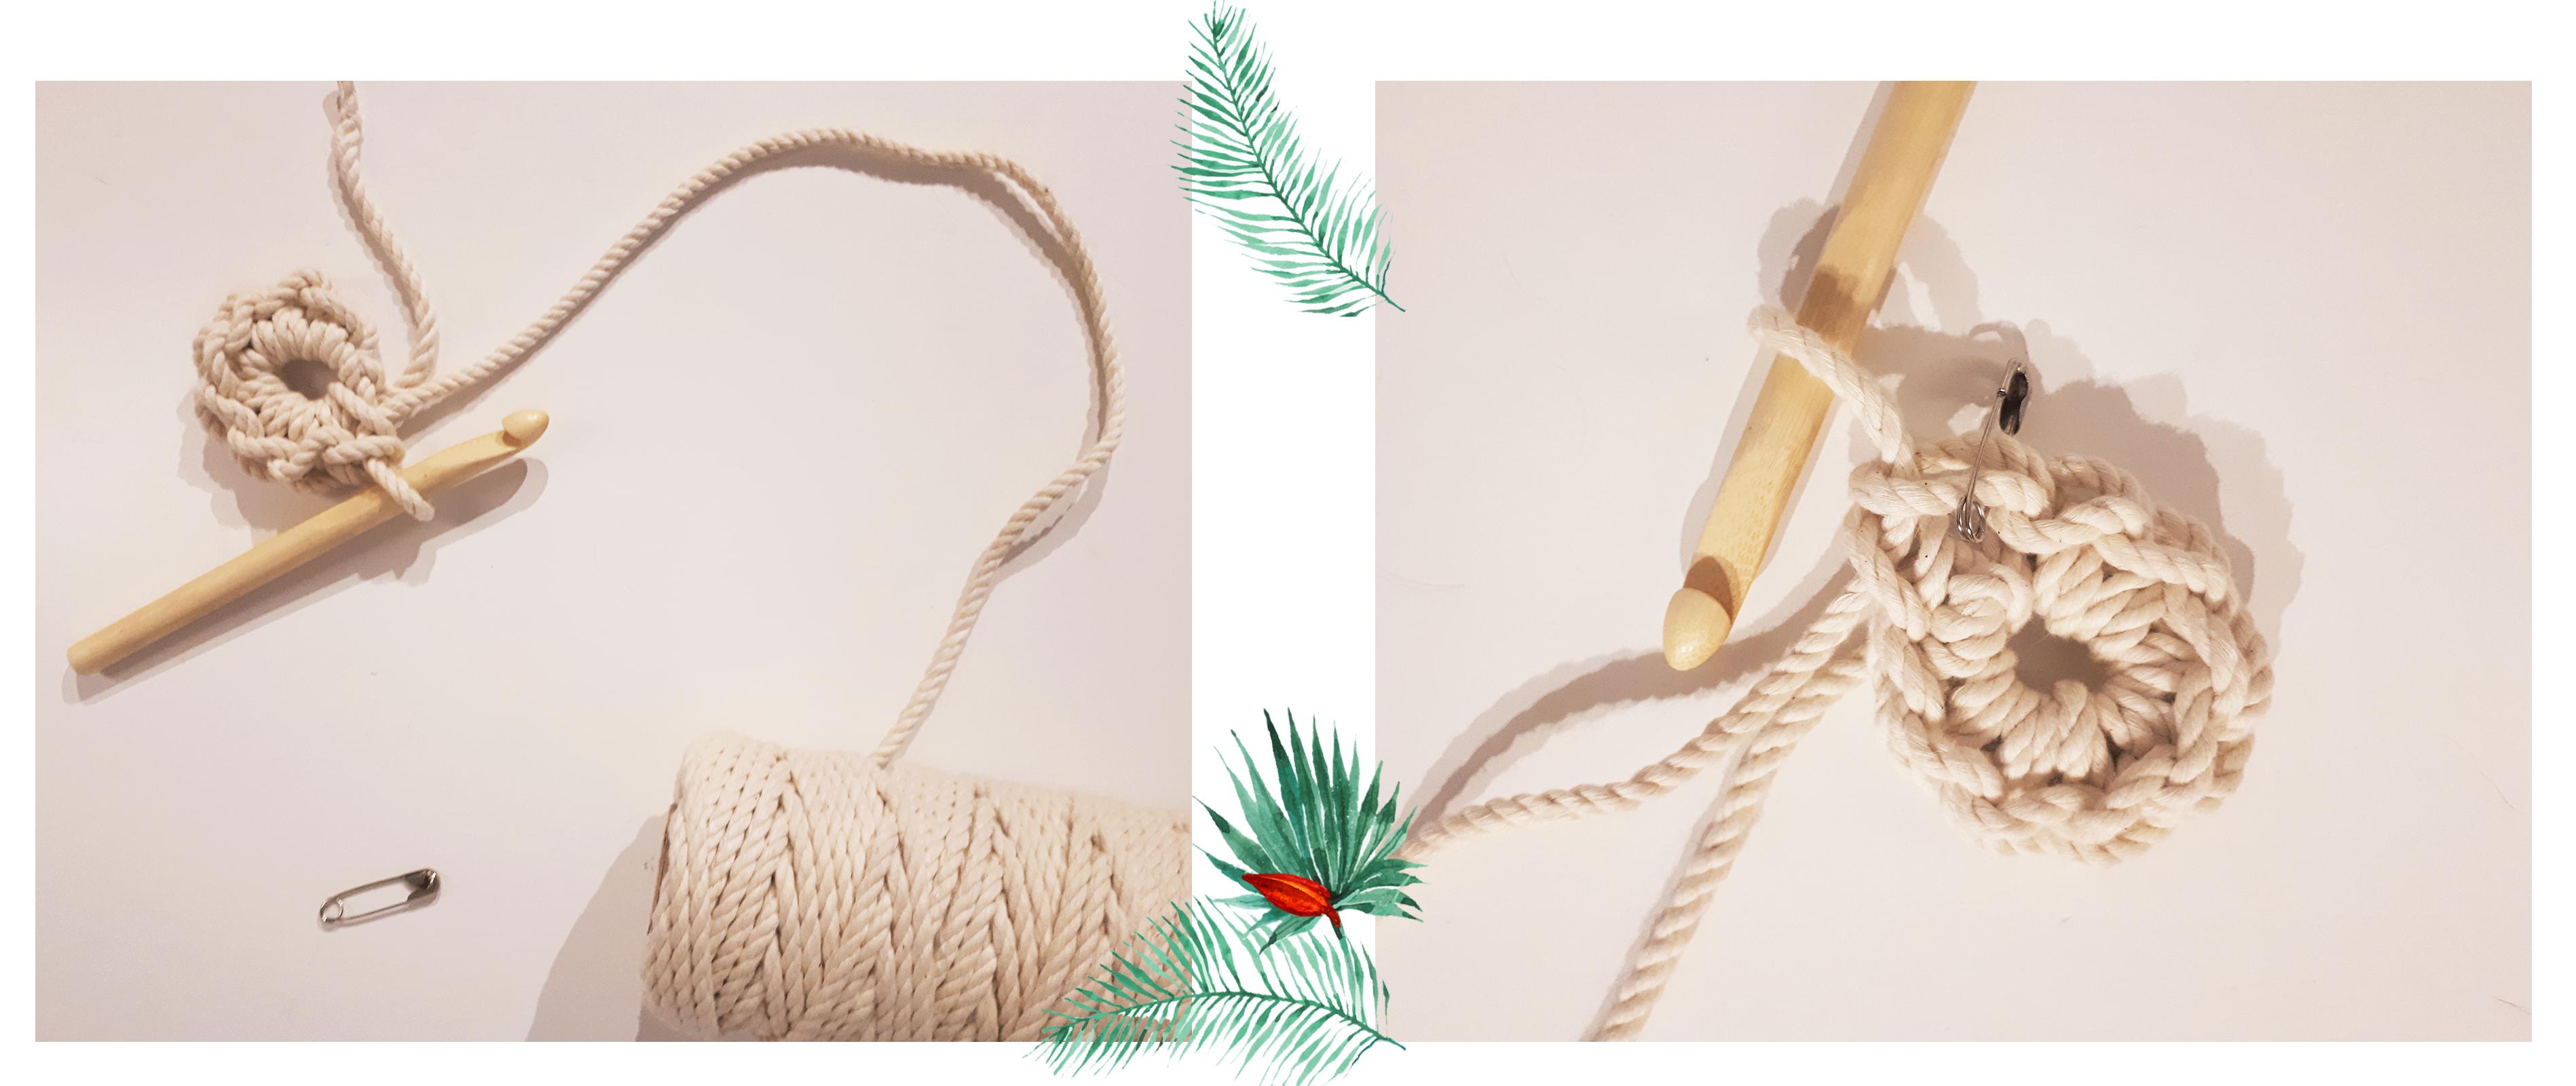 DIY-sac-rond-crochet-etape-3-4-Cactus-and-Style